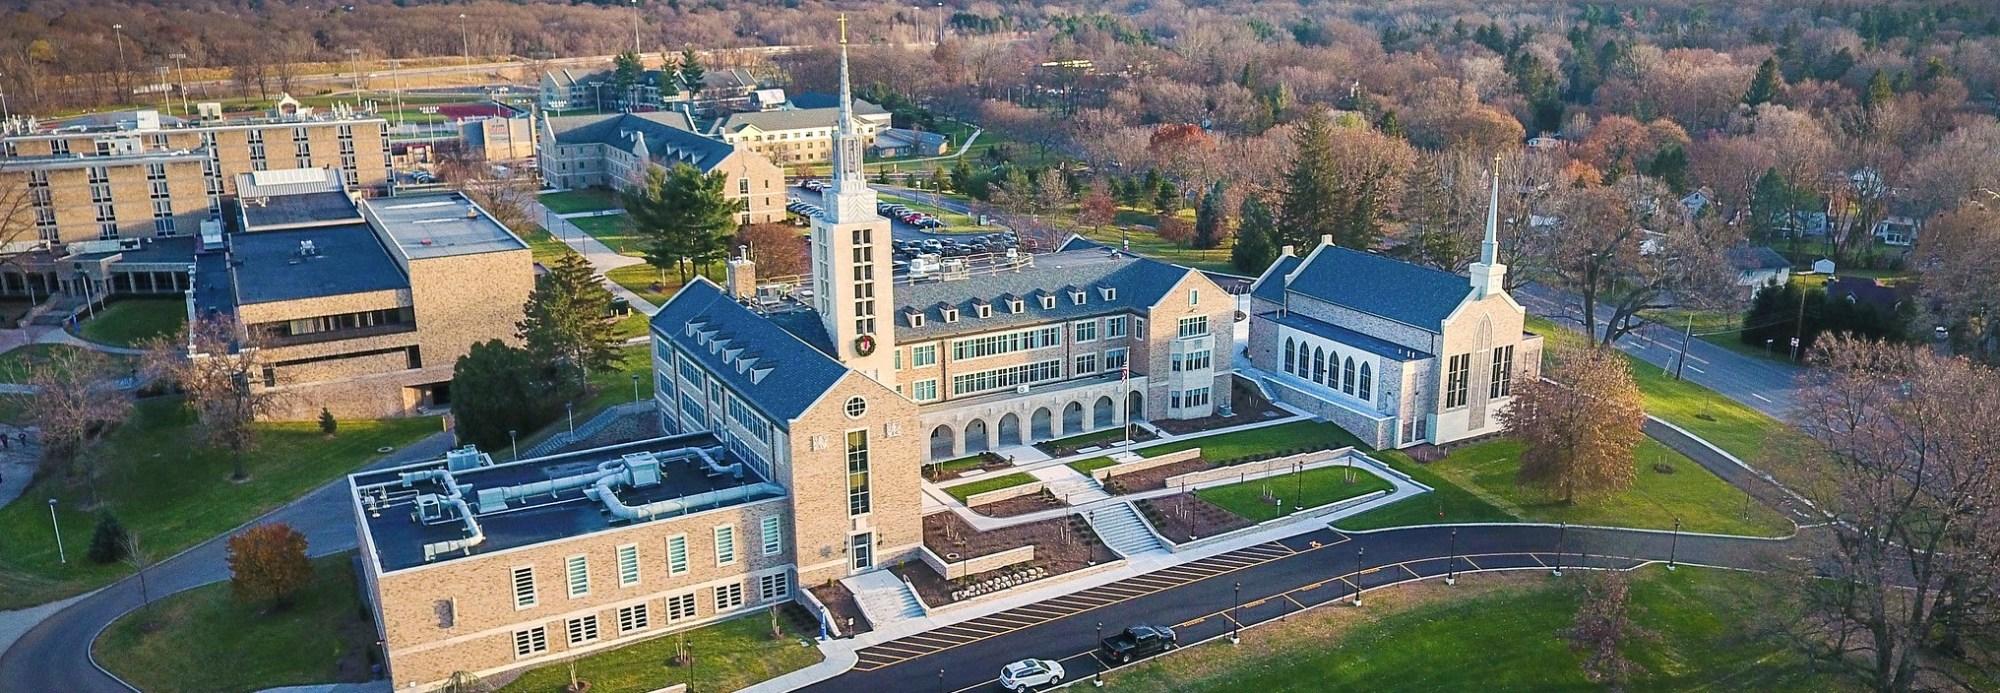 St John Fisher College, Kearney Hall